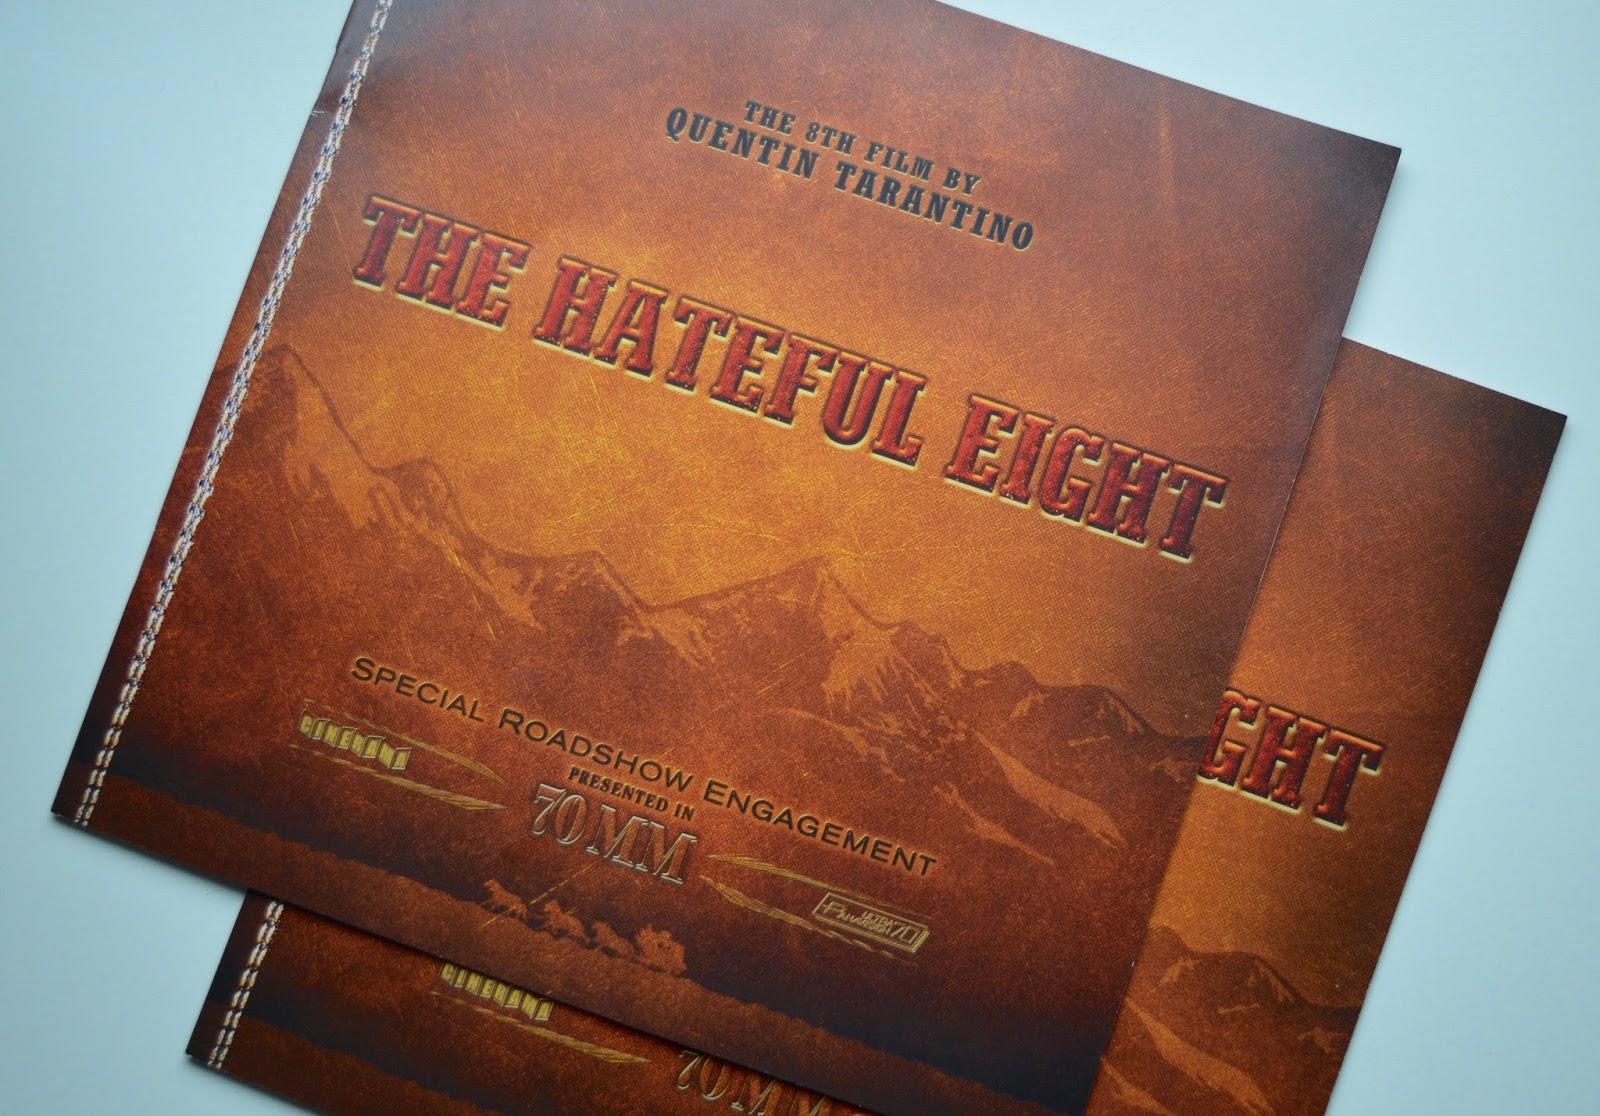 The Hateful Eight 70mm roadshow programme